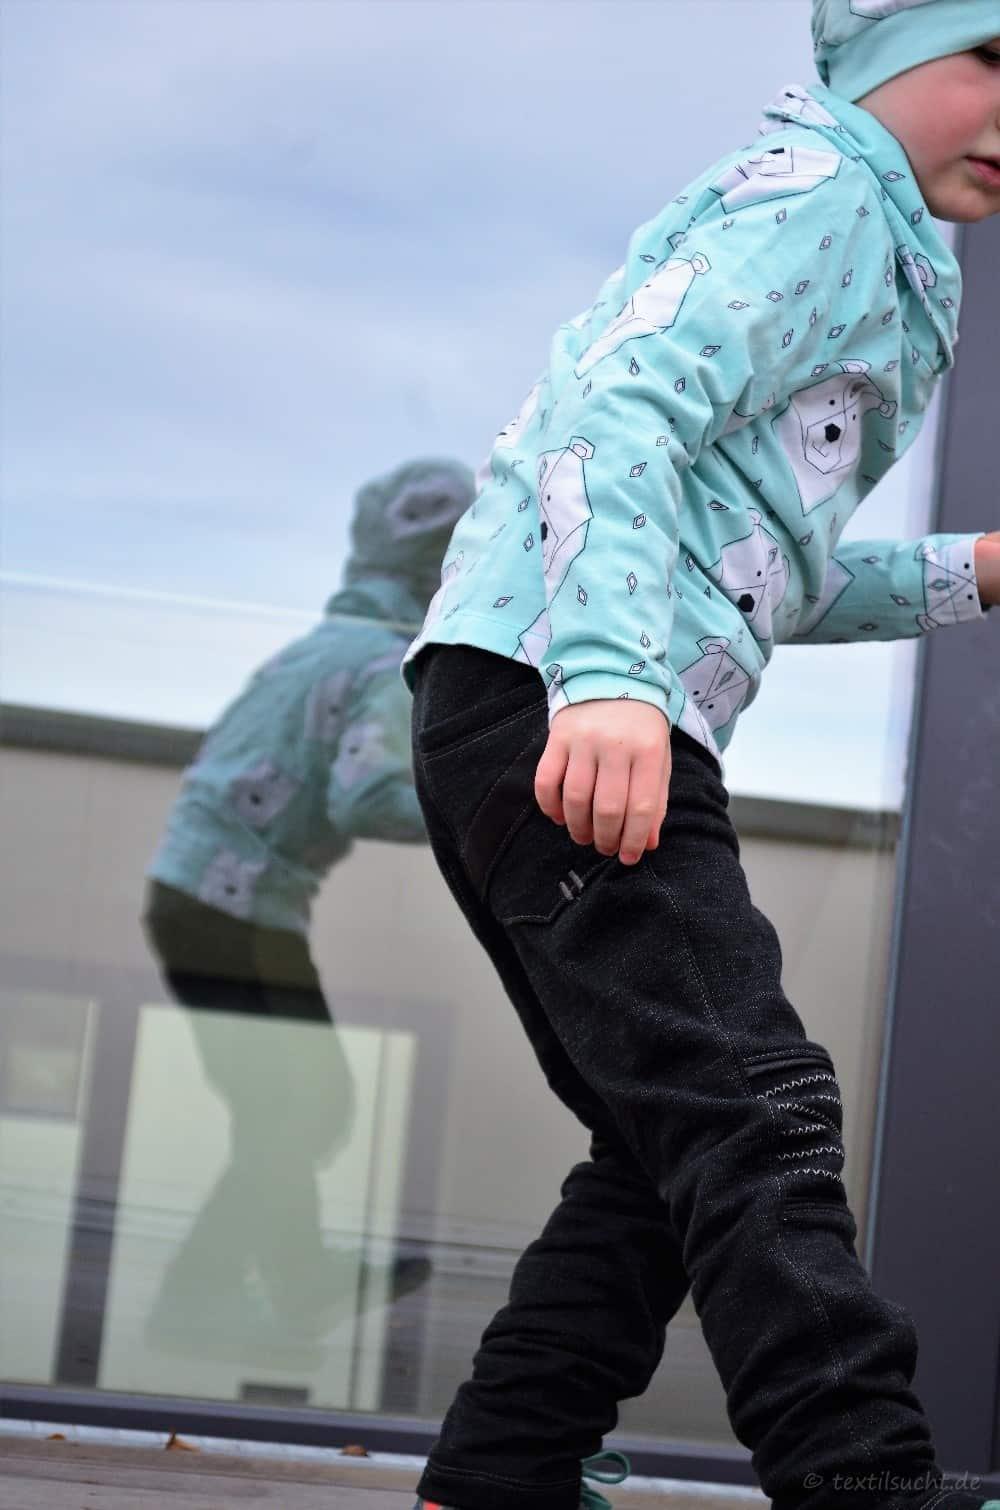 Schnittmuster Kinderhose Steppo aus Wollsweat - Bild 13 | textilsucht.de